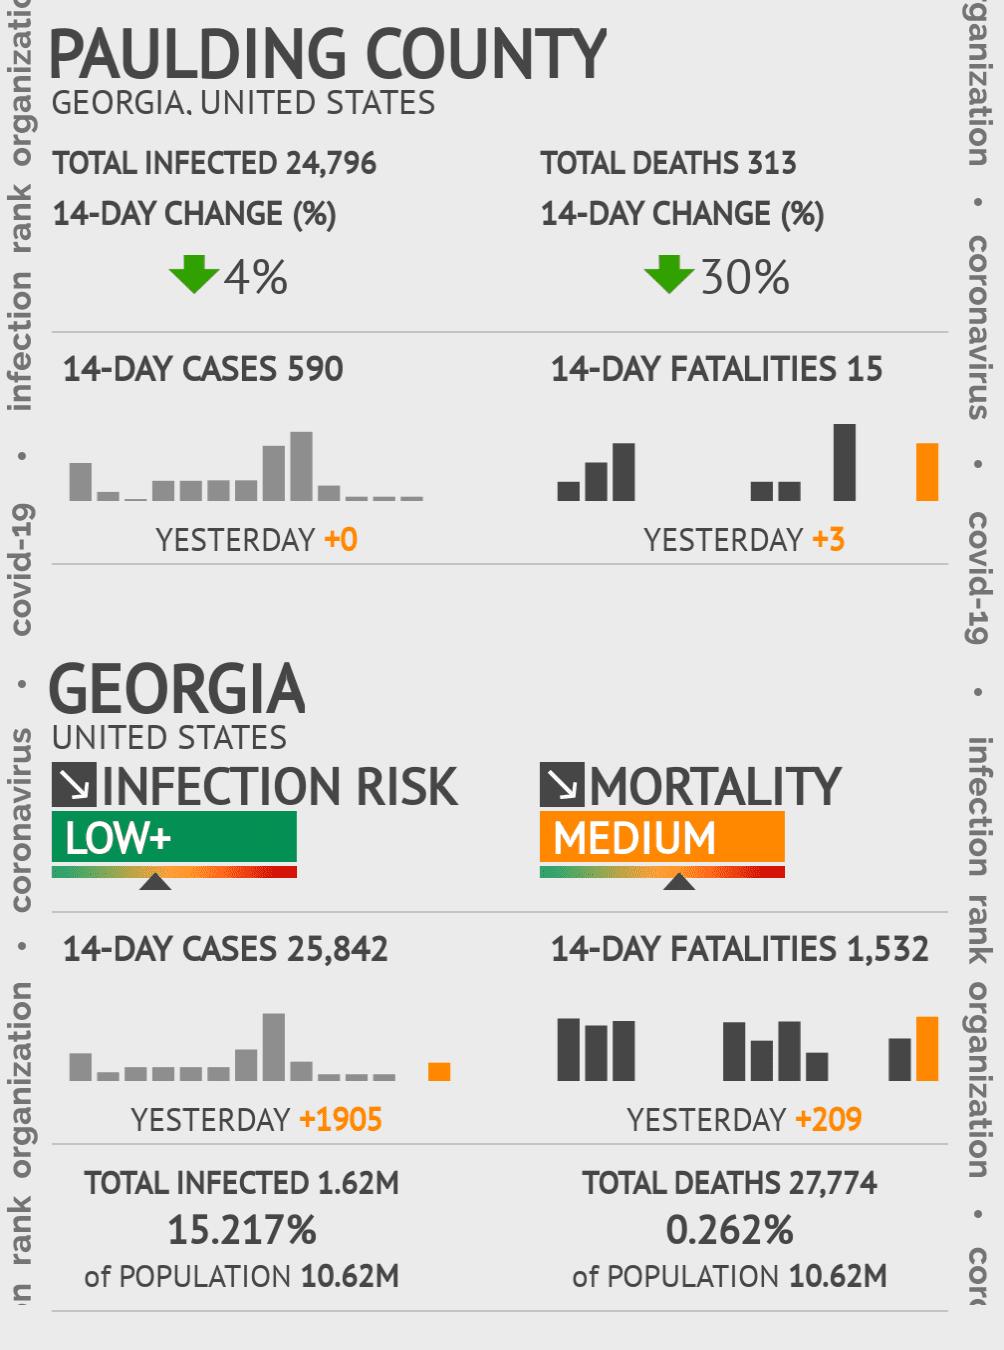 Paulding County Coronavirus Covid-19 Risk of Infection on January 22, 2021